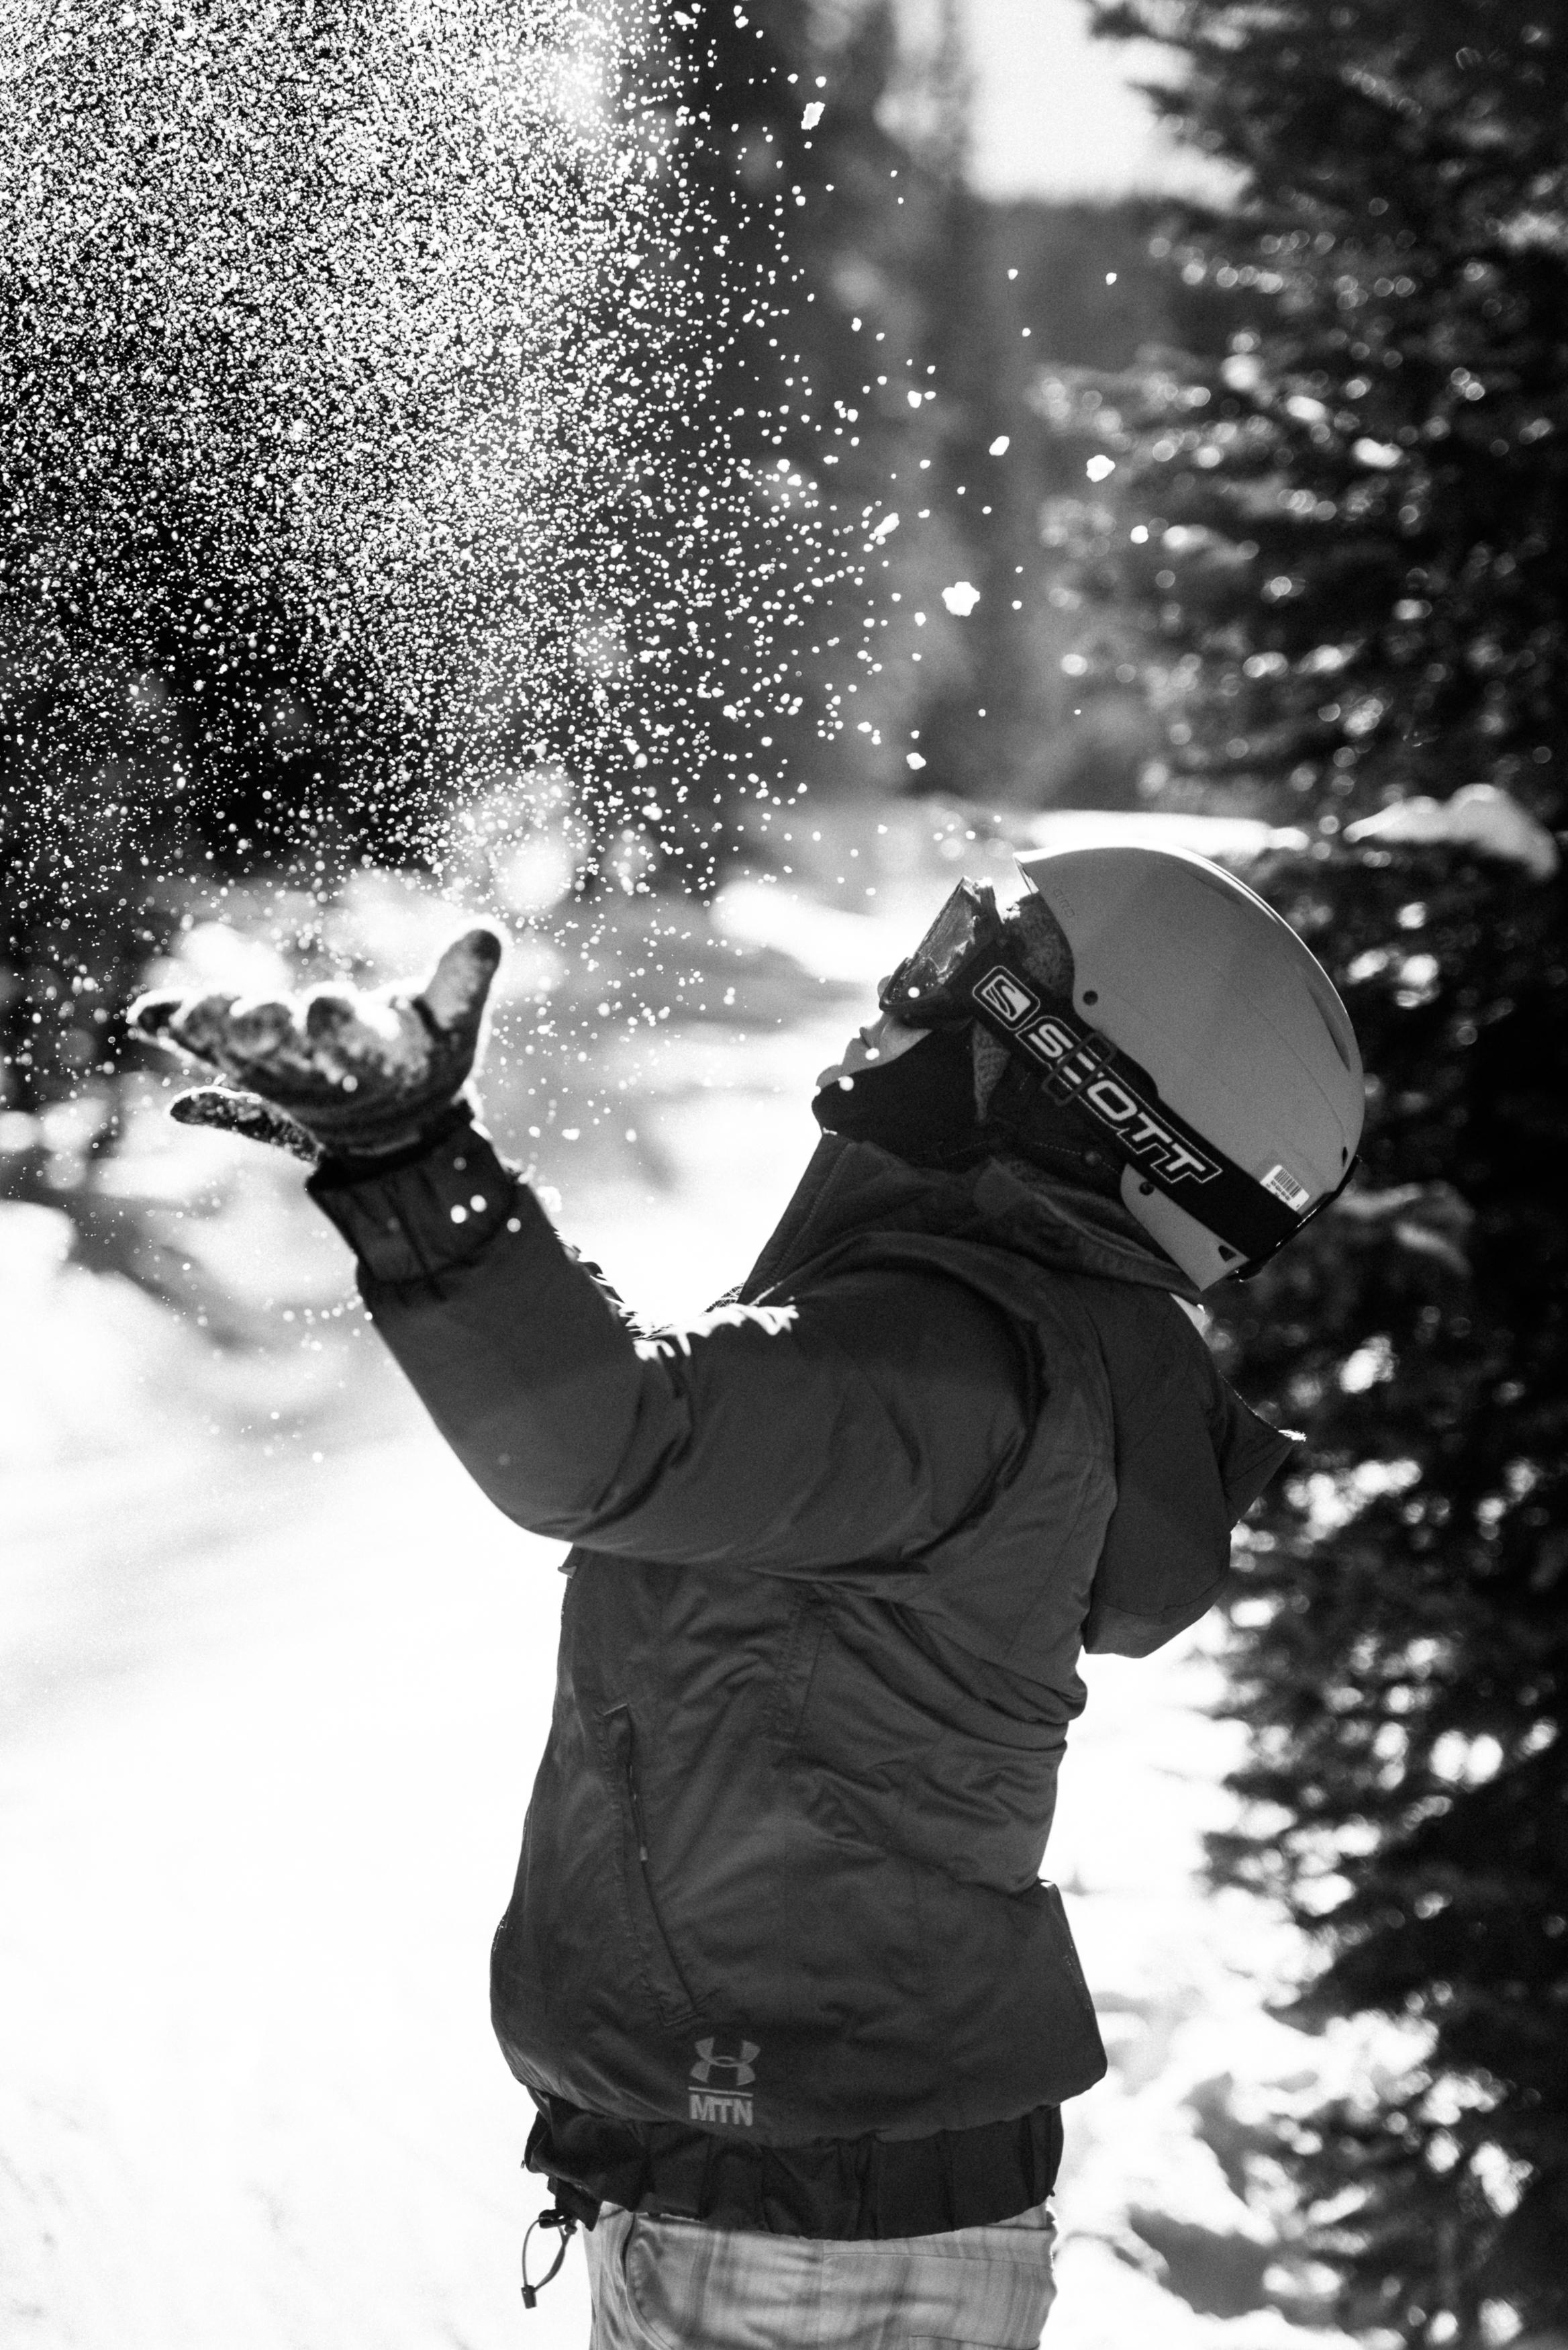 TaraShupe_Outdoor_Photographer_Loweprobags_Colorado_Copper_Mountains_Ski_38.jpg